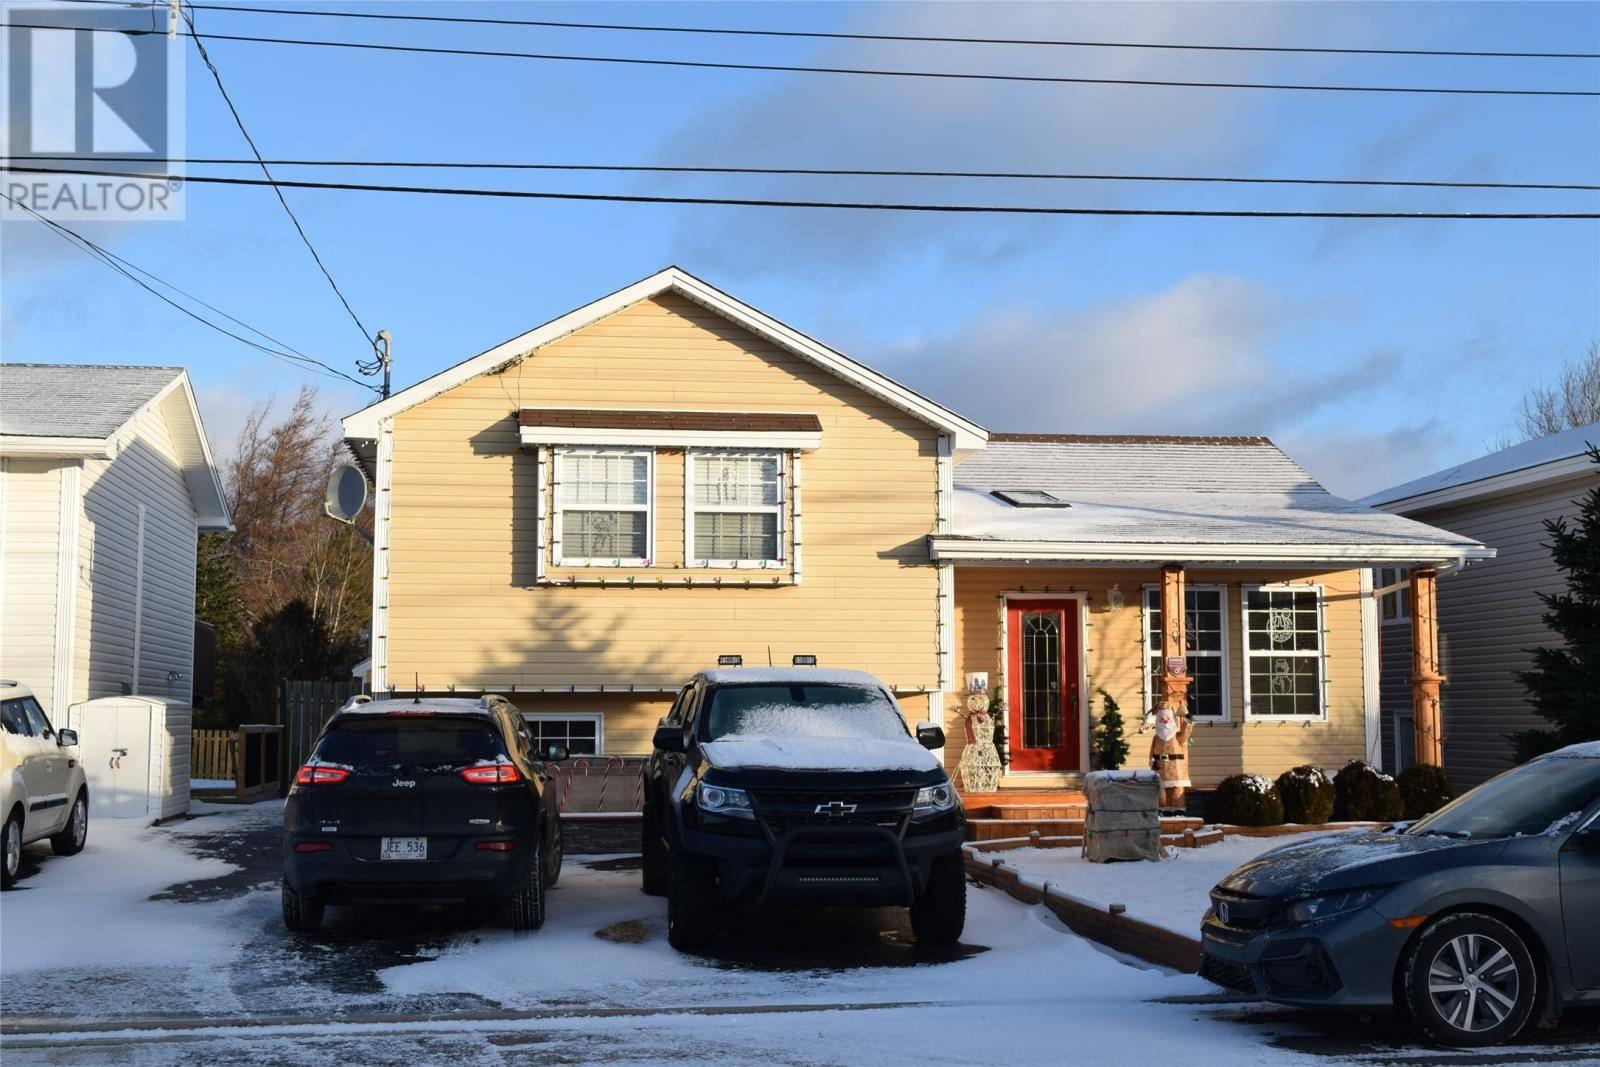 House for sale at 50 Beaverbrook Dr St. John's Newfoundland - MLS: 1209011